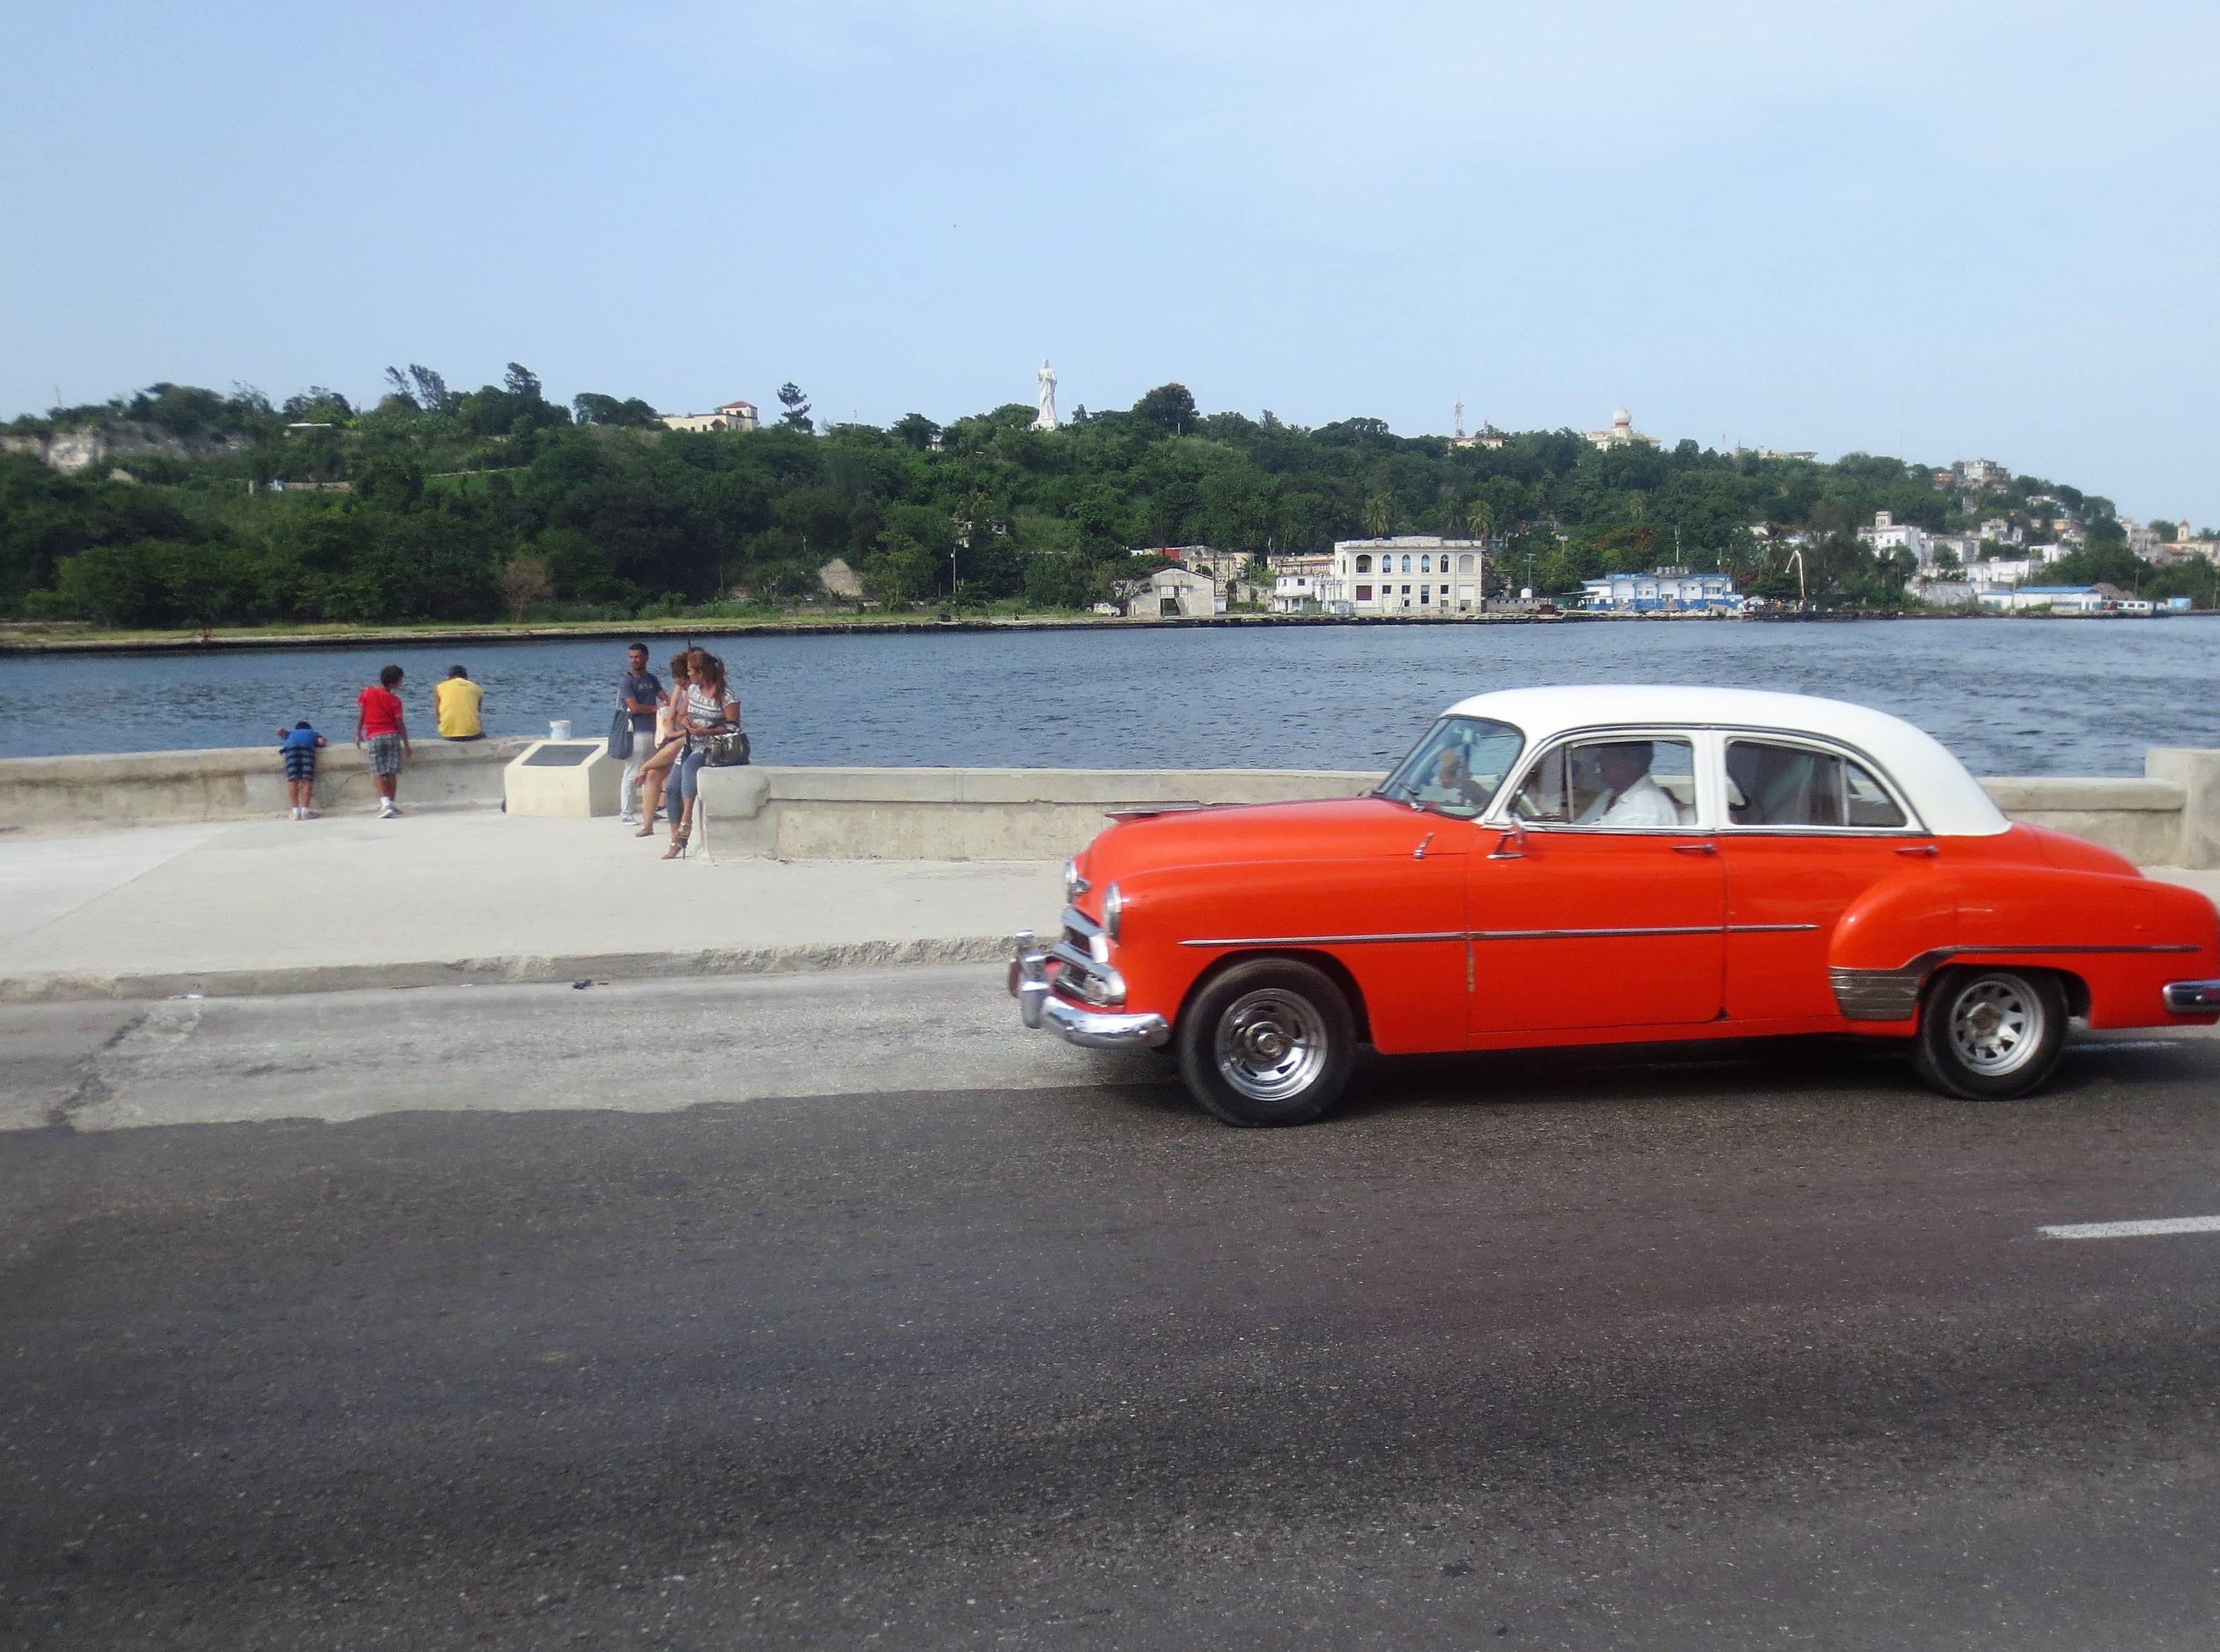 Havana's famous Malecón, a 5-mile seaside promenade.